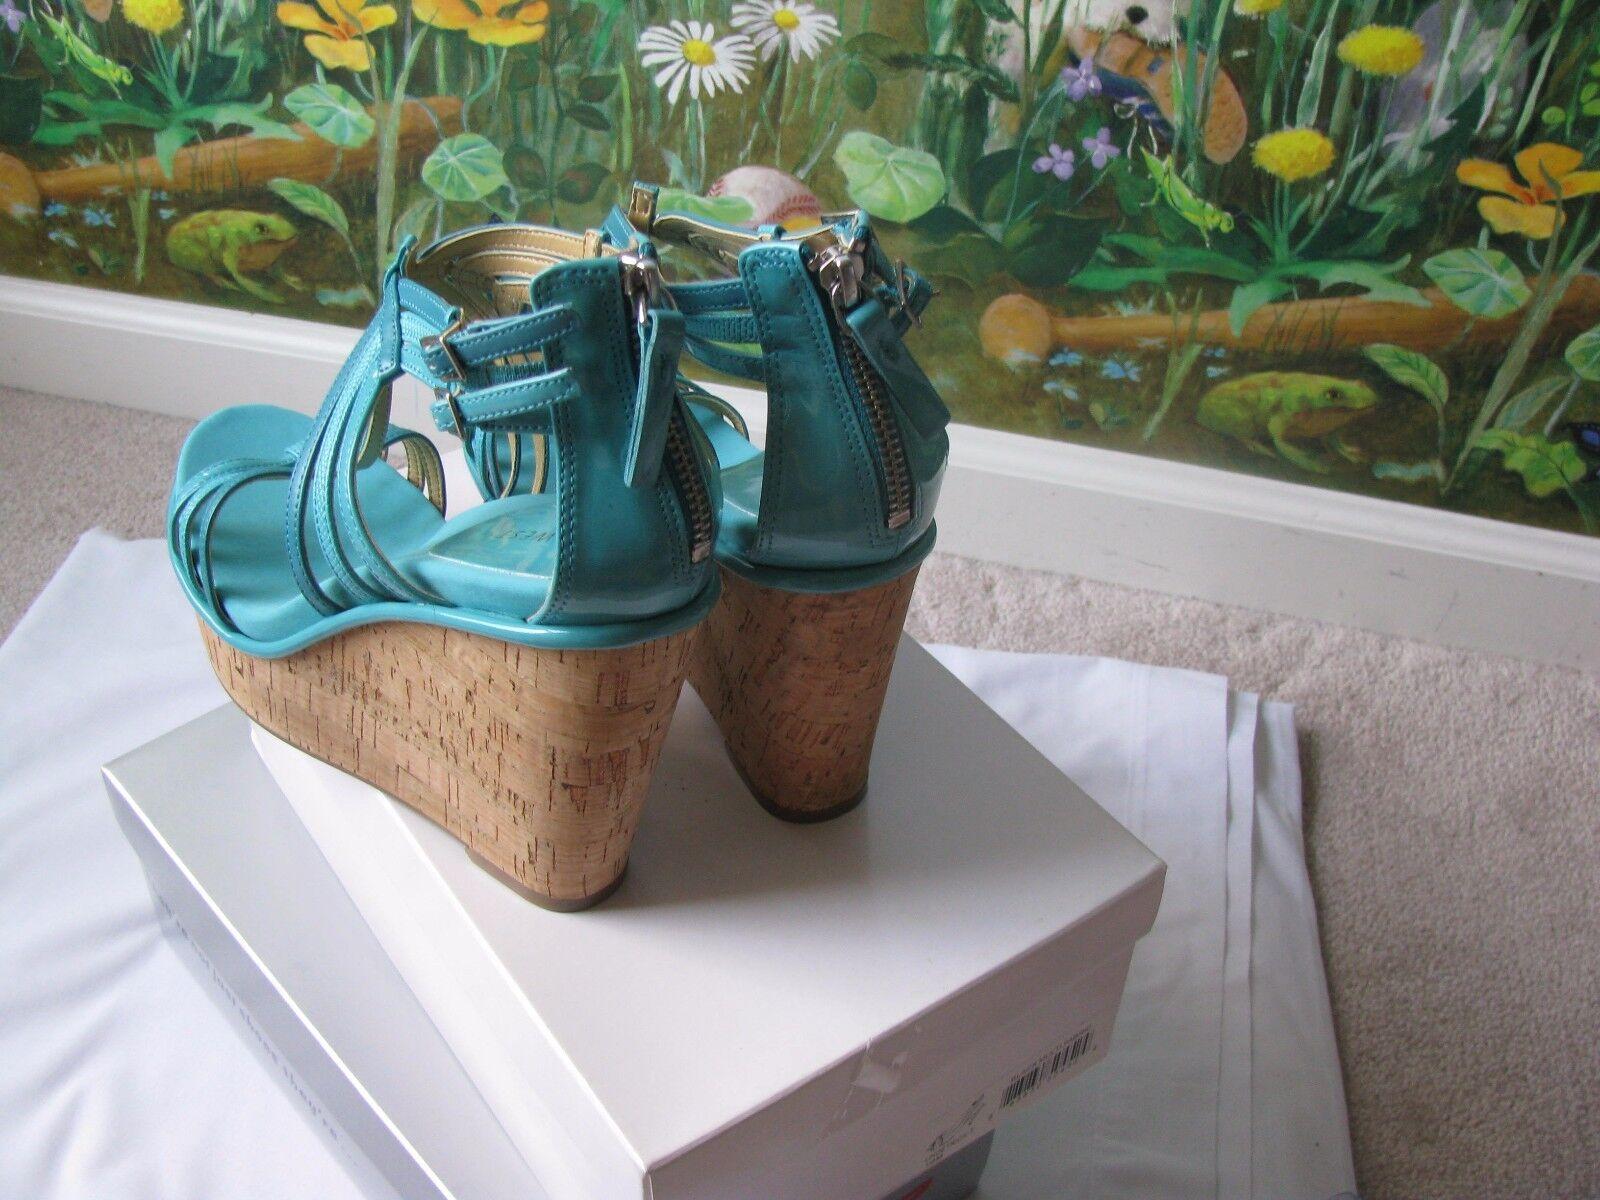 Nine Synthetic West Women Romancing Blue Synthetic Nine Leather Wedge High Heel Shoe Size 8.5 83c3e8